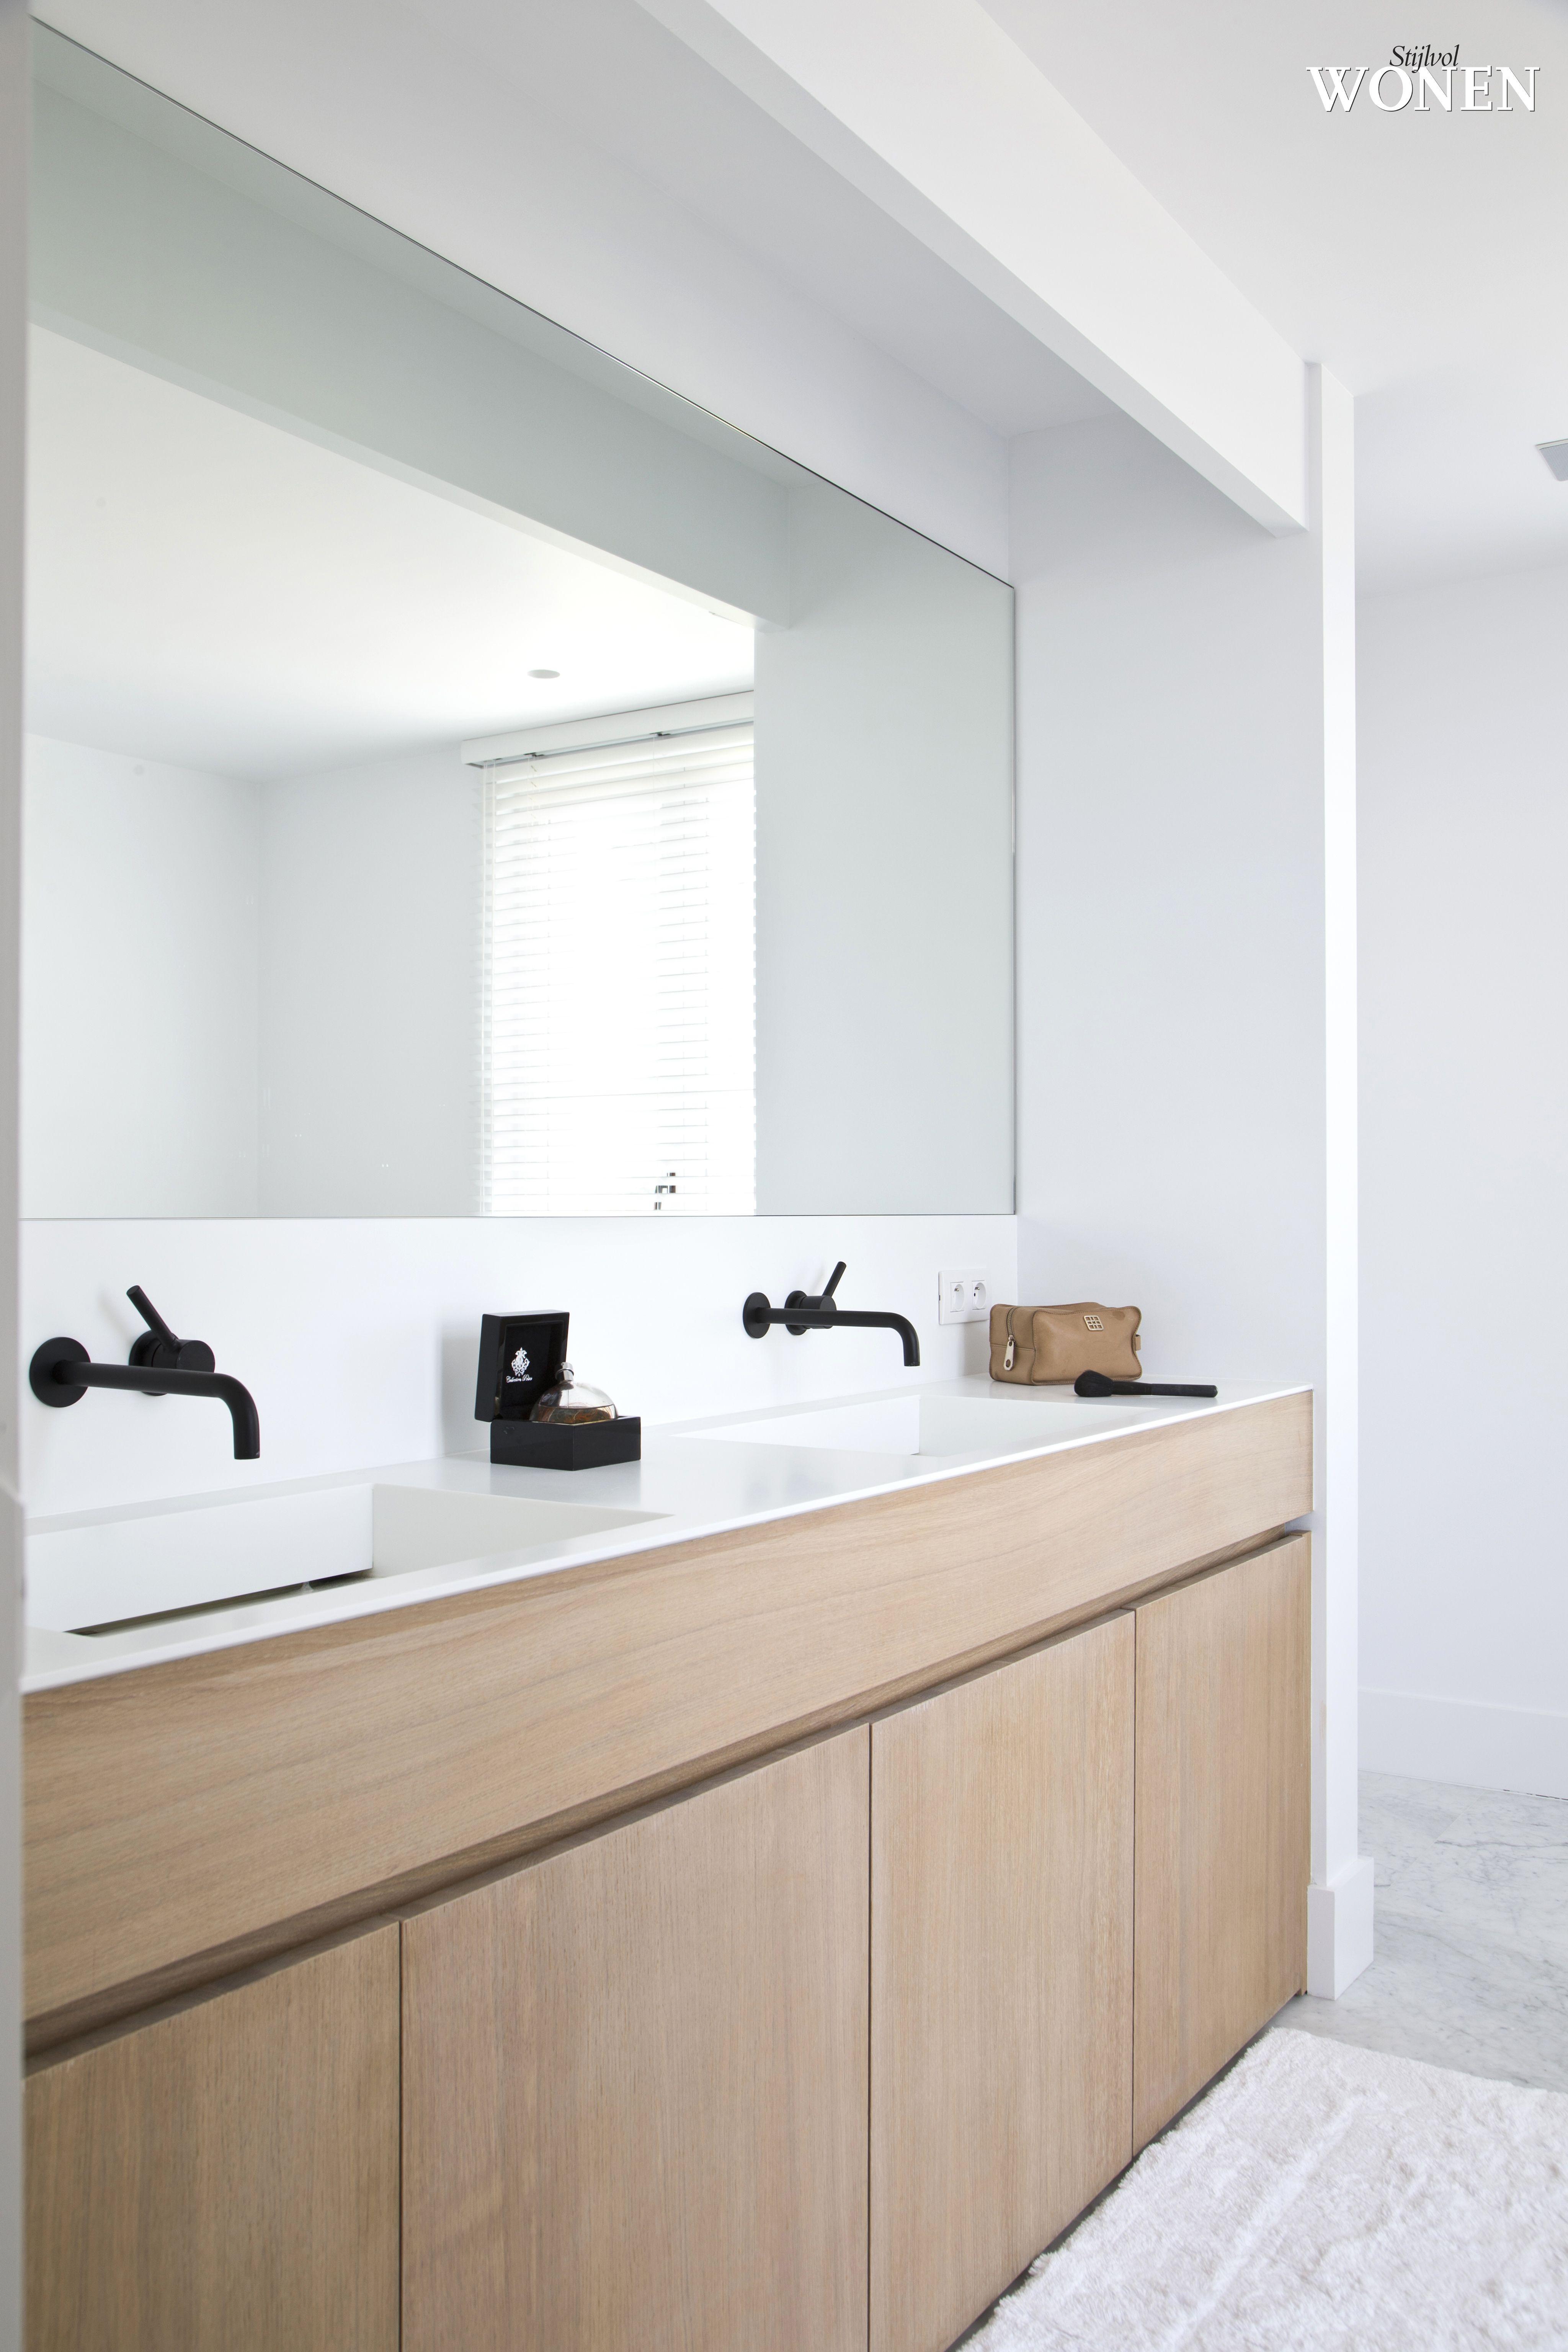 Badezimmerfliesenideen um badewanne bathroom in wood and white by oscar v   gillies  pinterest